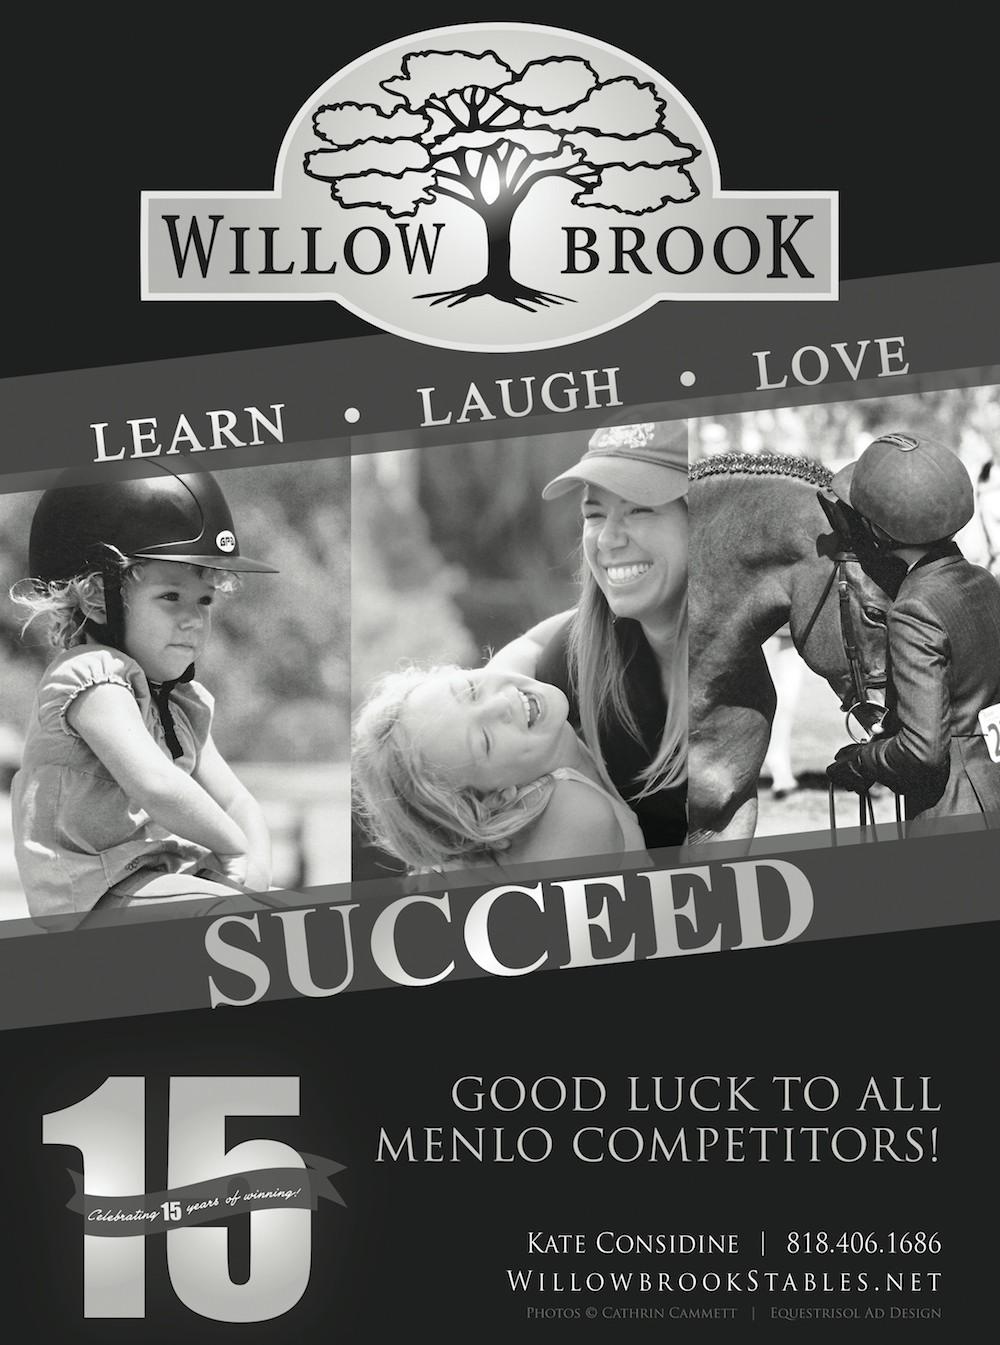 WillowBrook-2013Menlo-sponsor-site